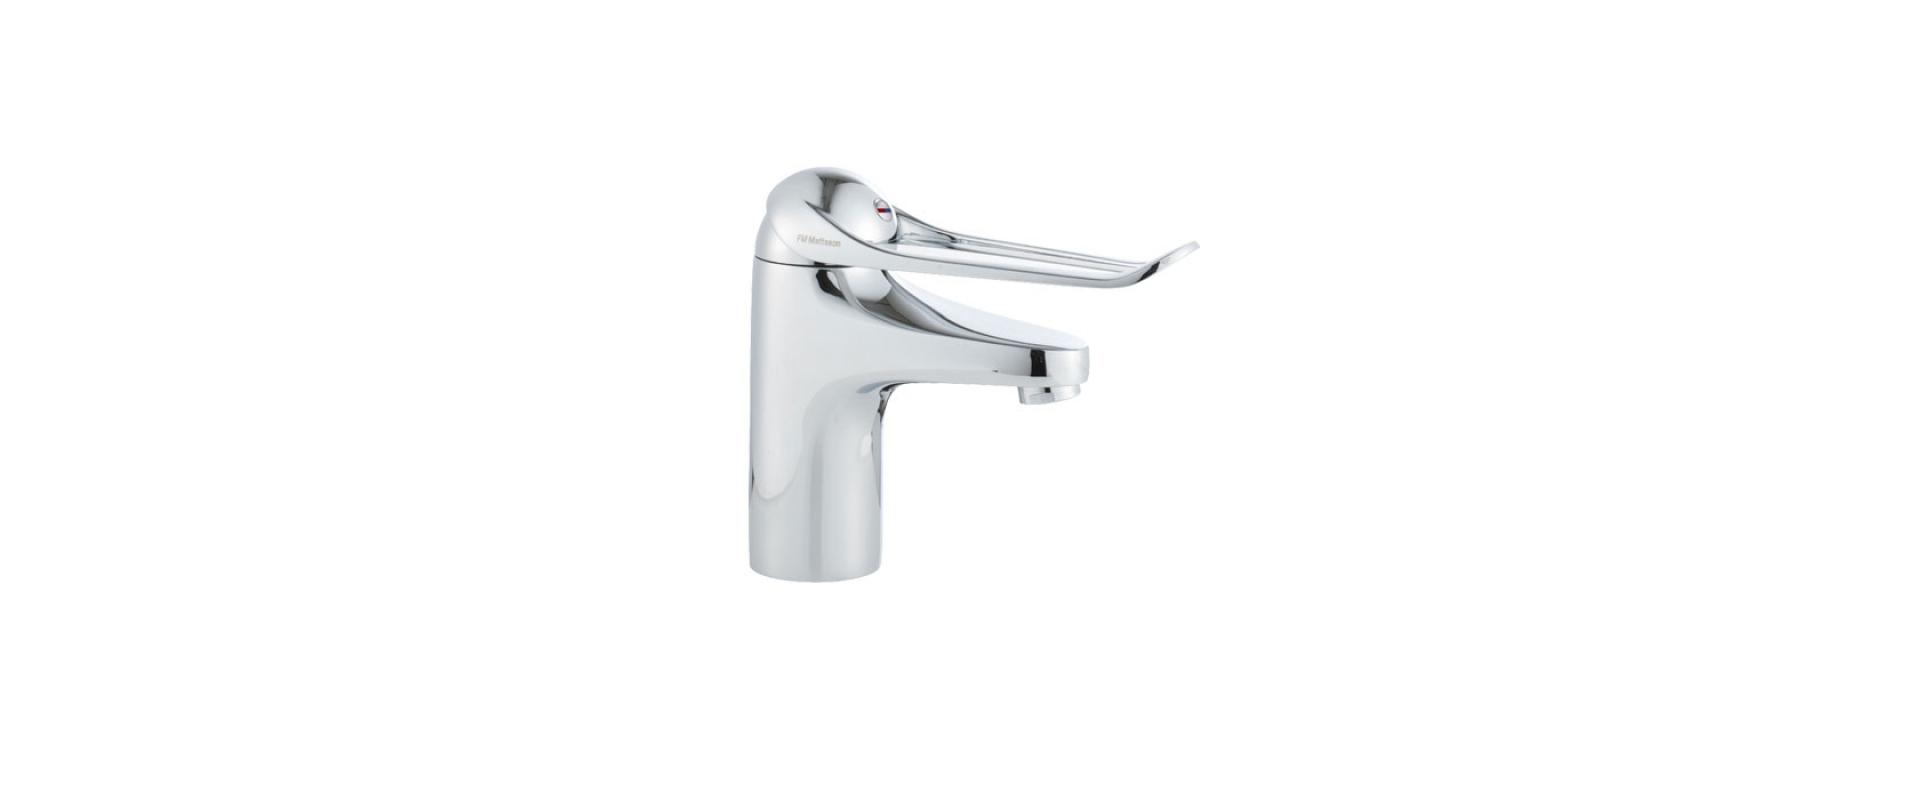 Tvättställsblandare 425-105